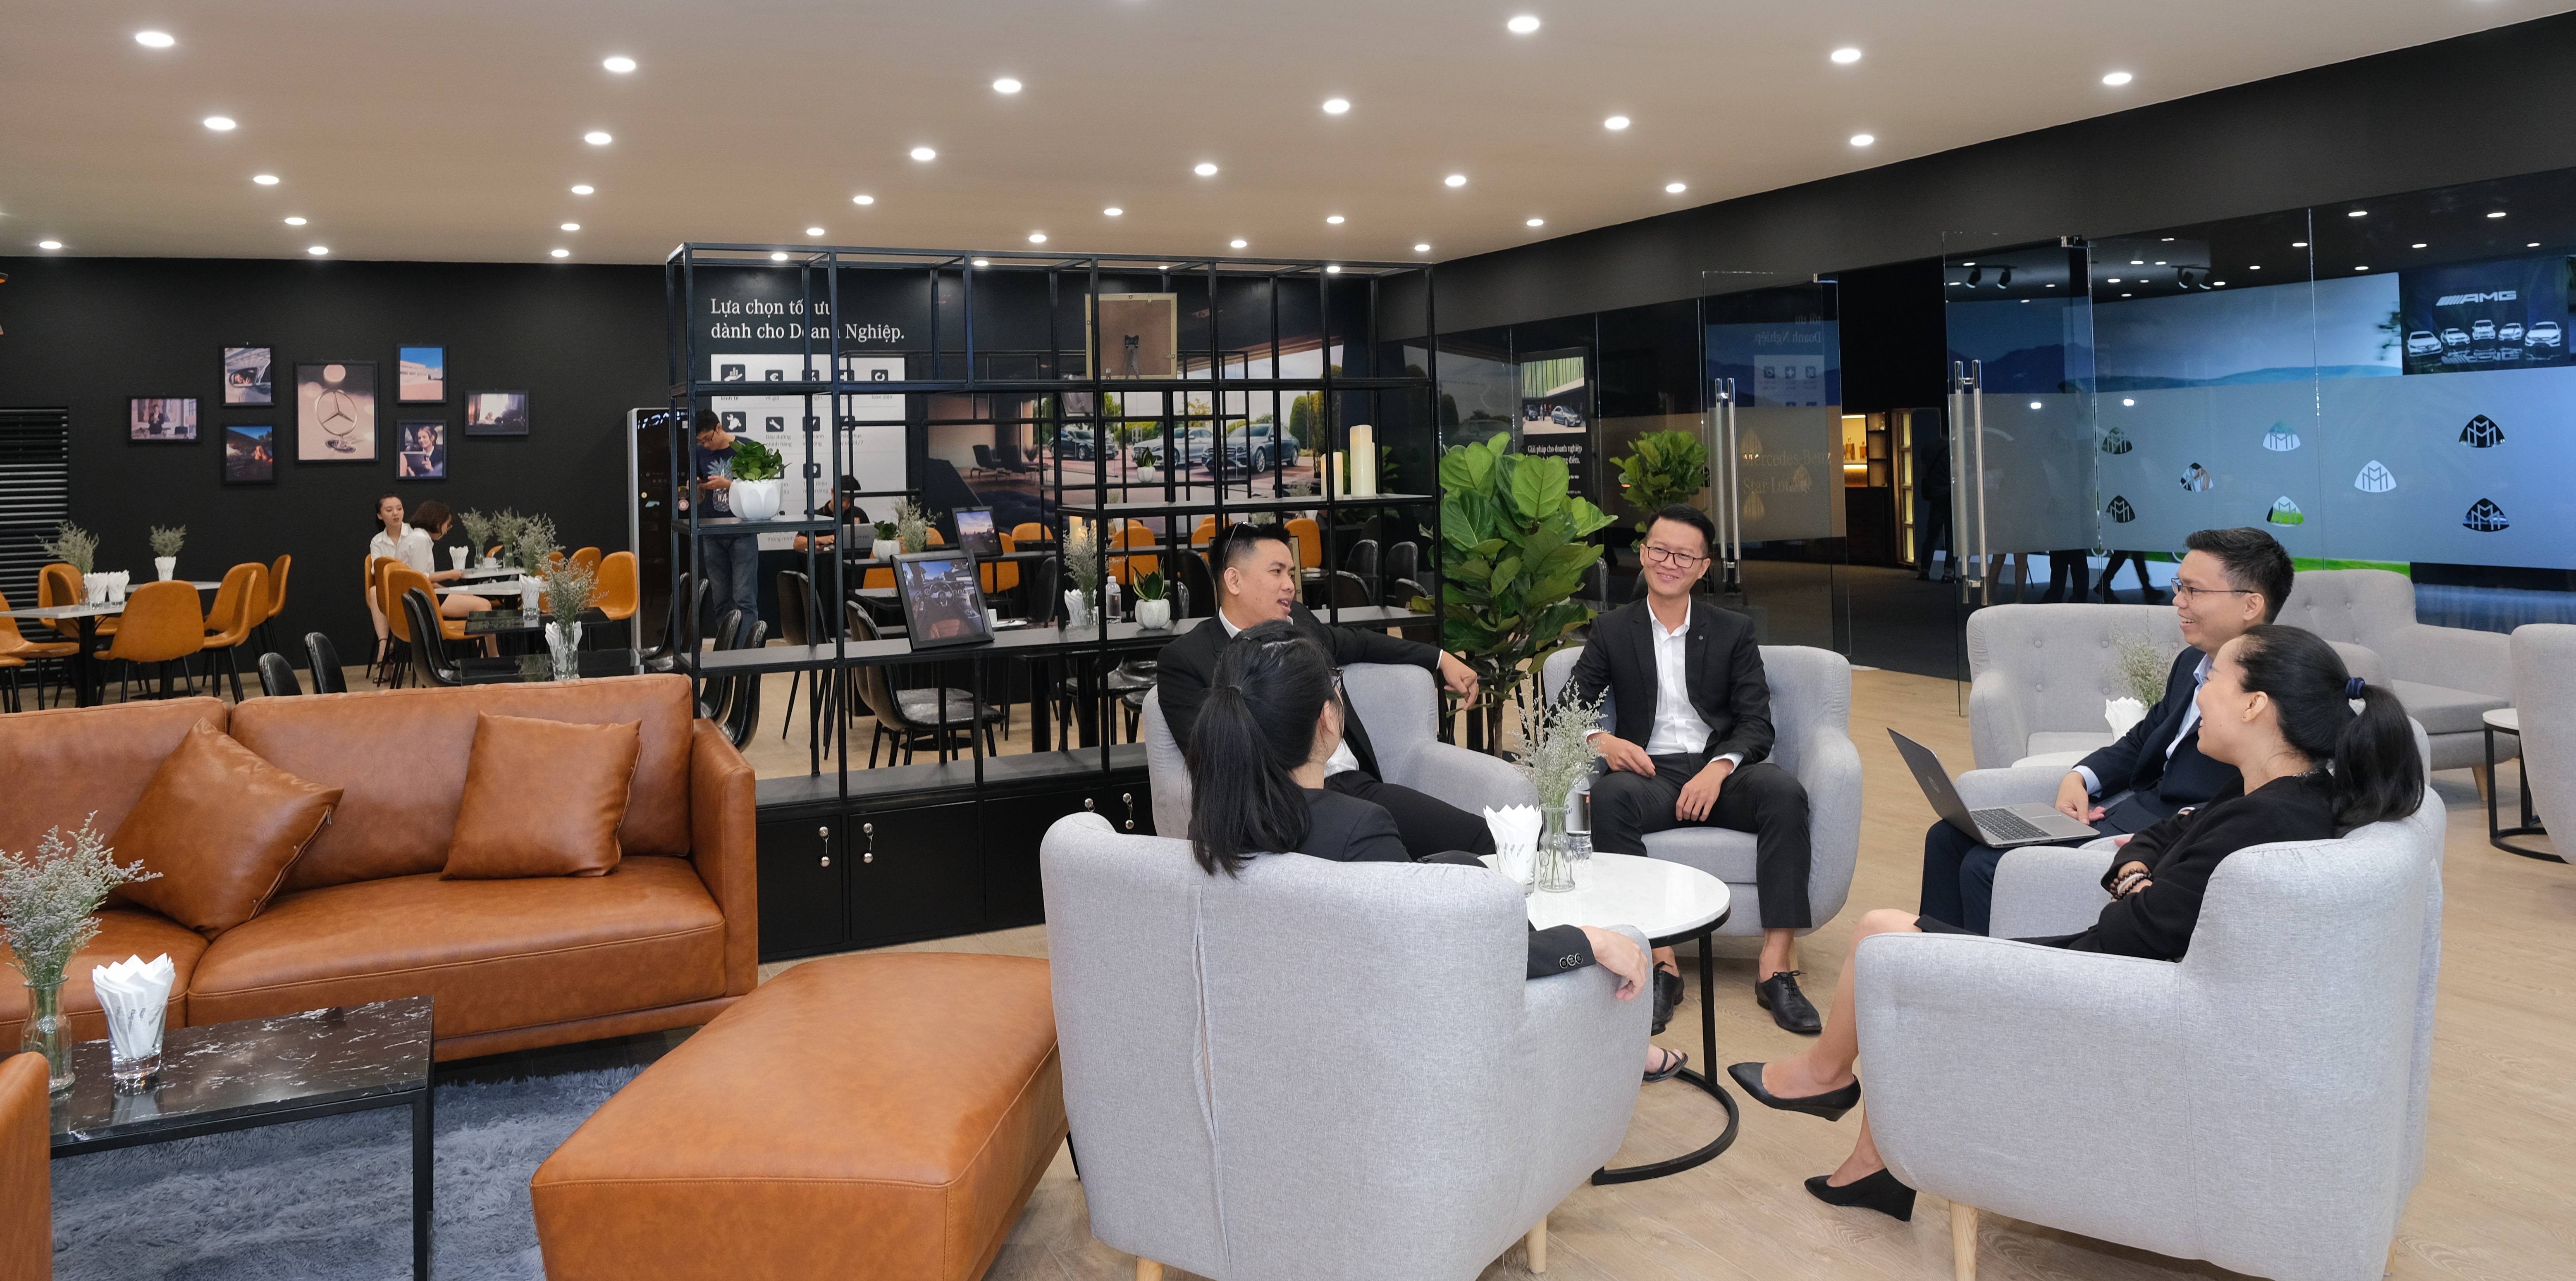 Khai mạc triển lãm Mercedes-Benz Fascination 2019 tại Hà Nội - 8